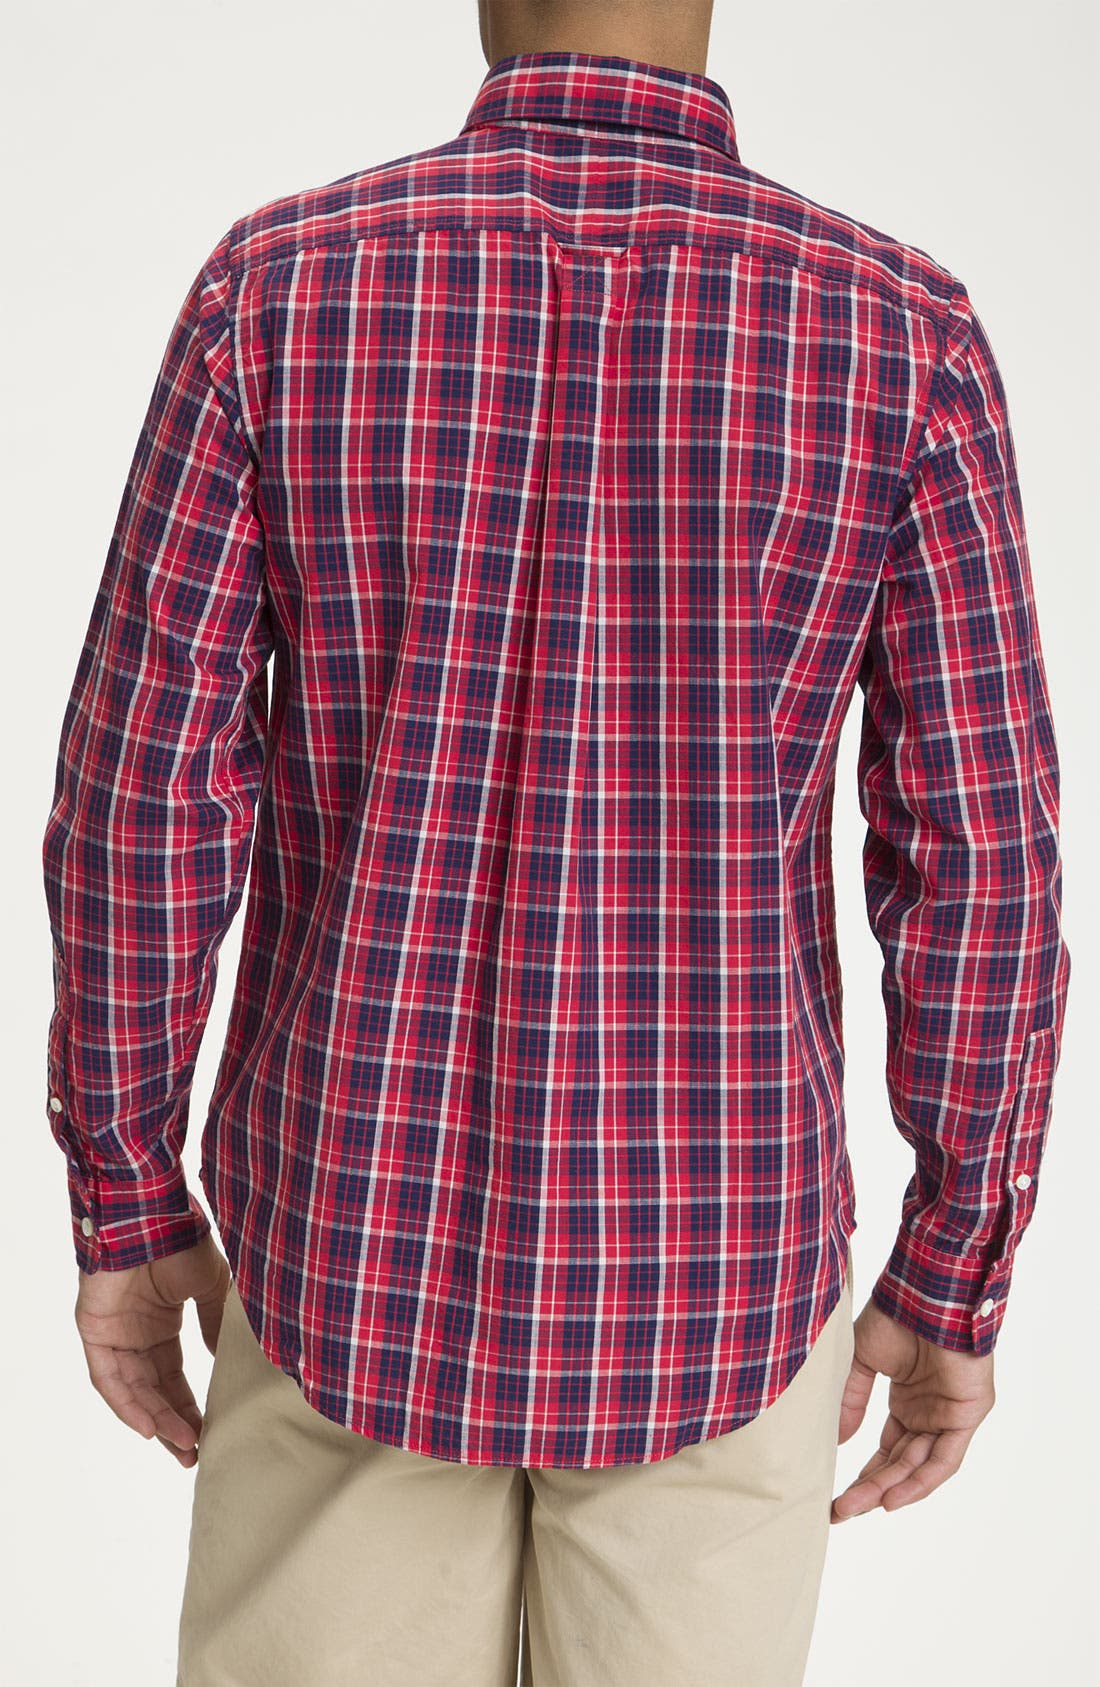 Alternate Image 2  - Jack Spade 'Adler' Plaid Woven Shirt